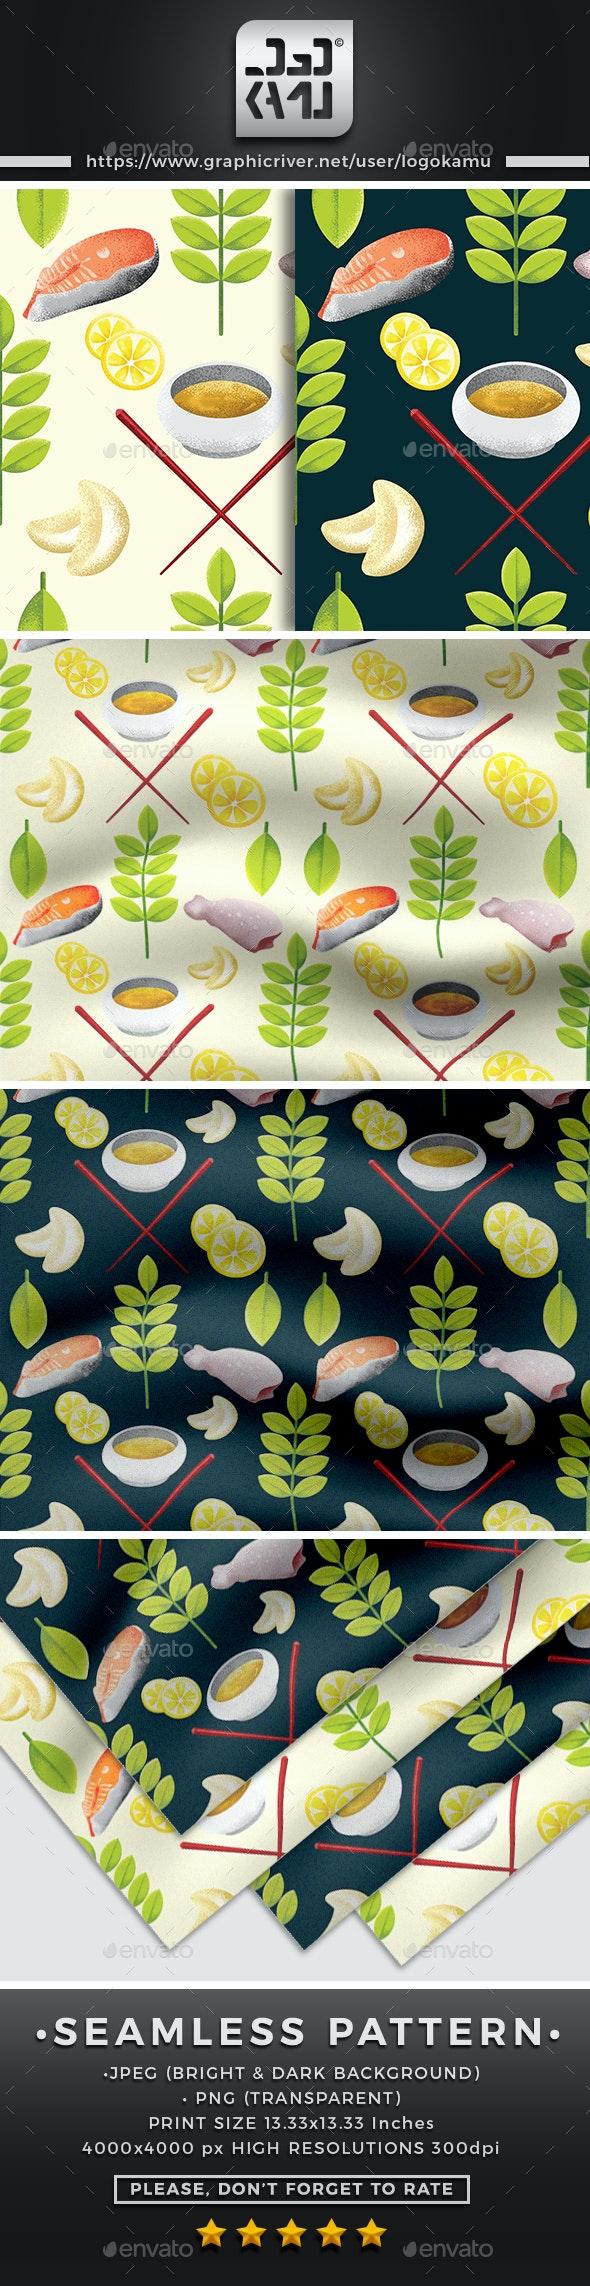 Meat Seamless Pattern - Patterns Backgrounds